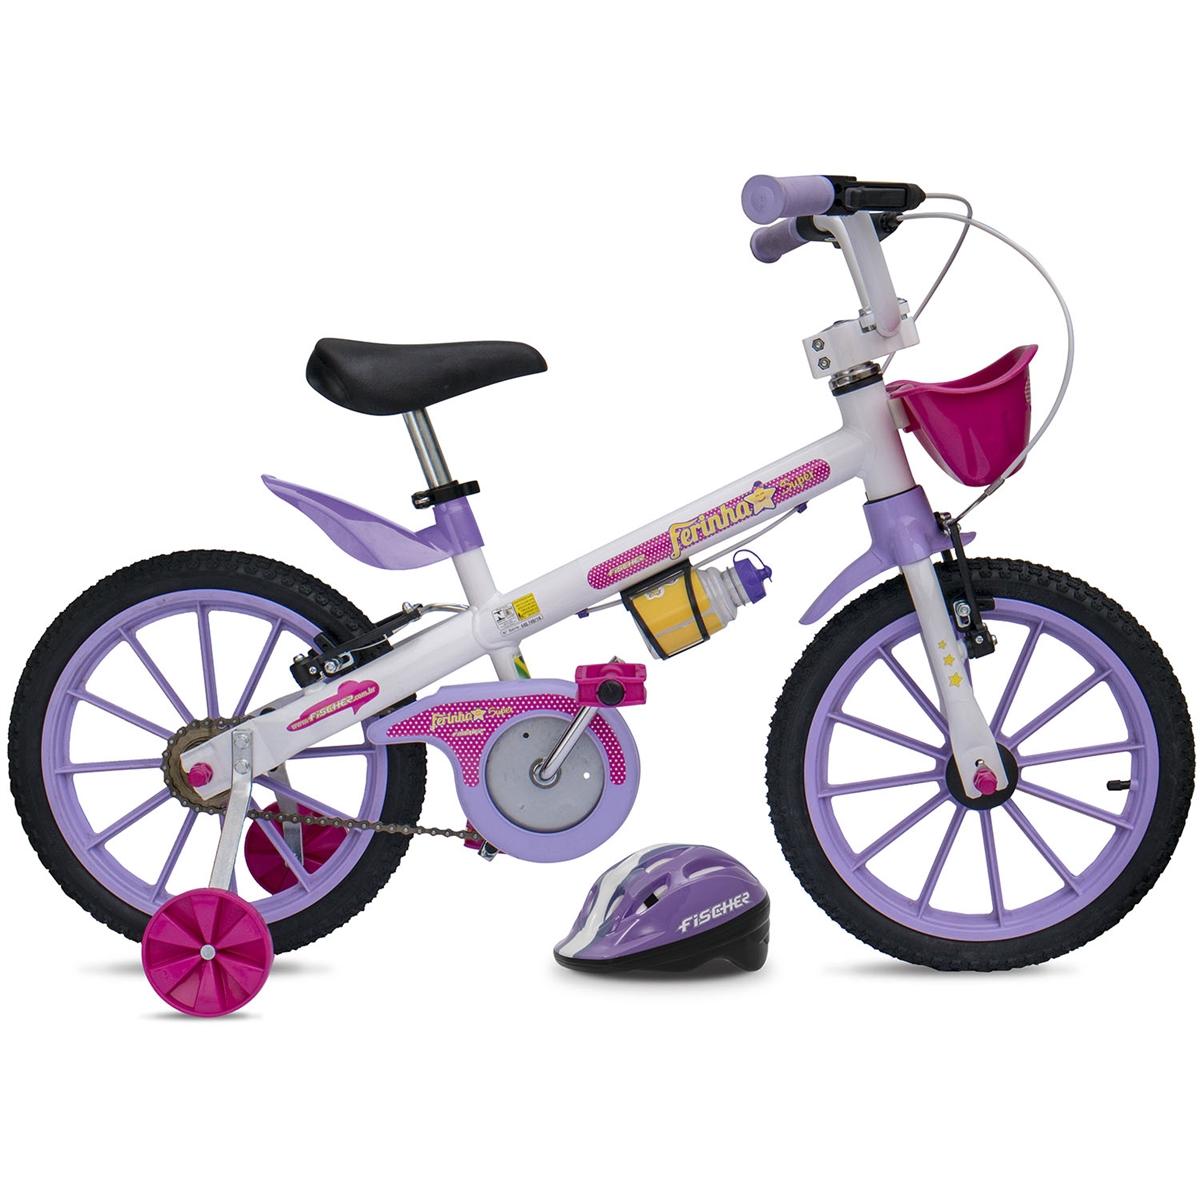 Bicicleta Infantil Aro 16 Ferinha Branca 17342-18811 Fischer